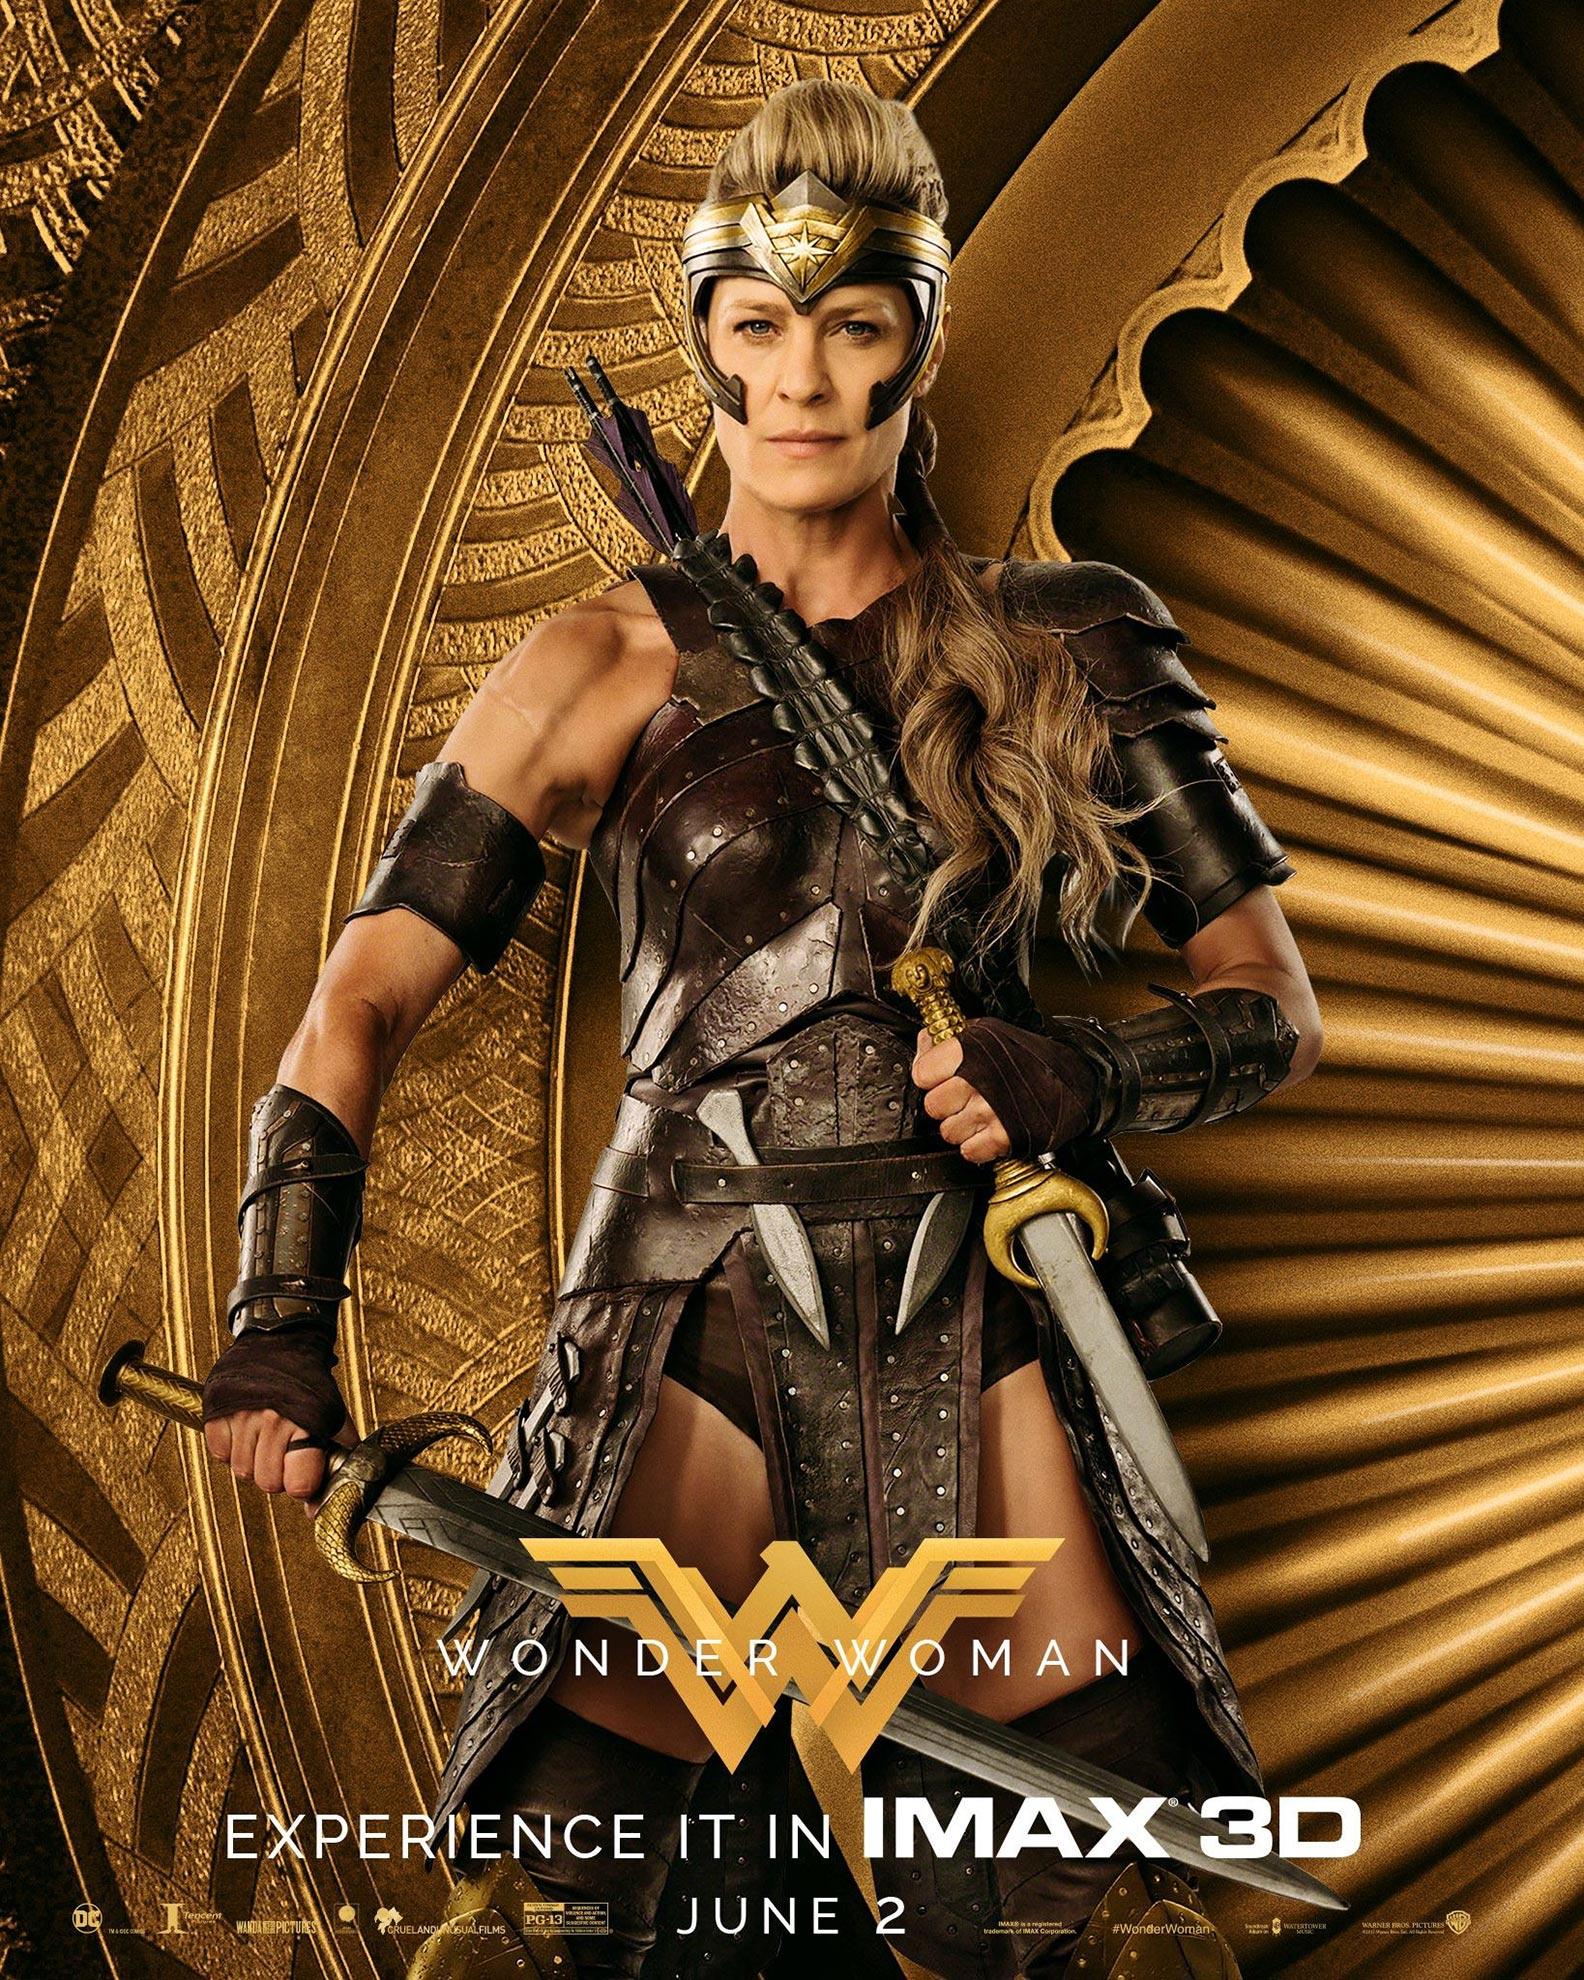 Wonder Woman Poster #11